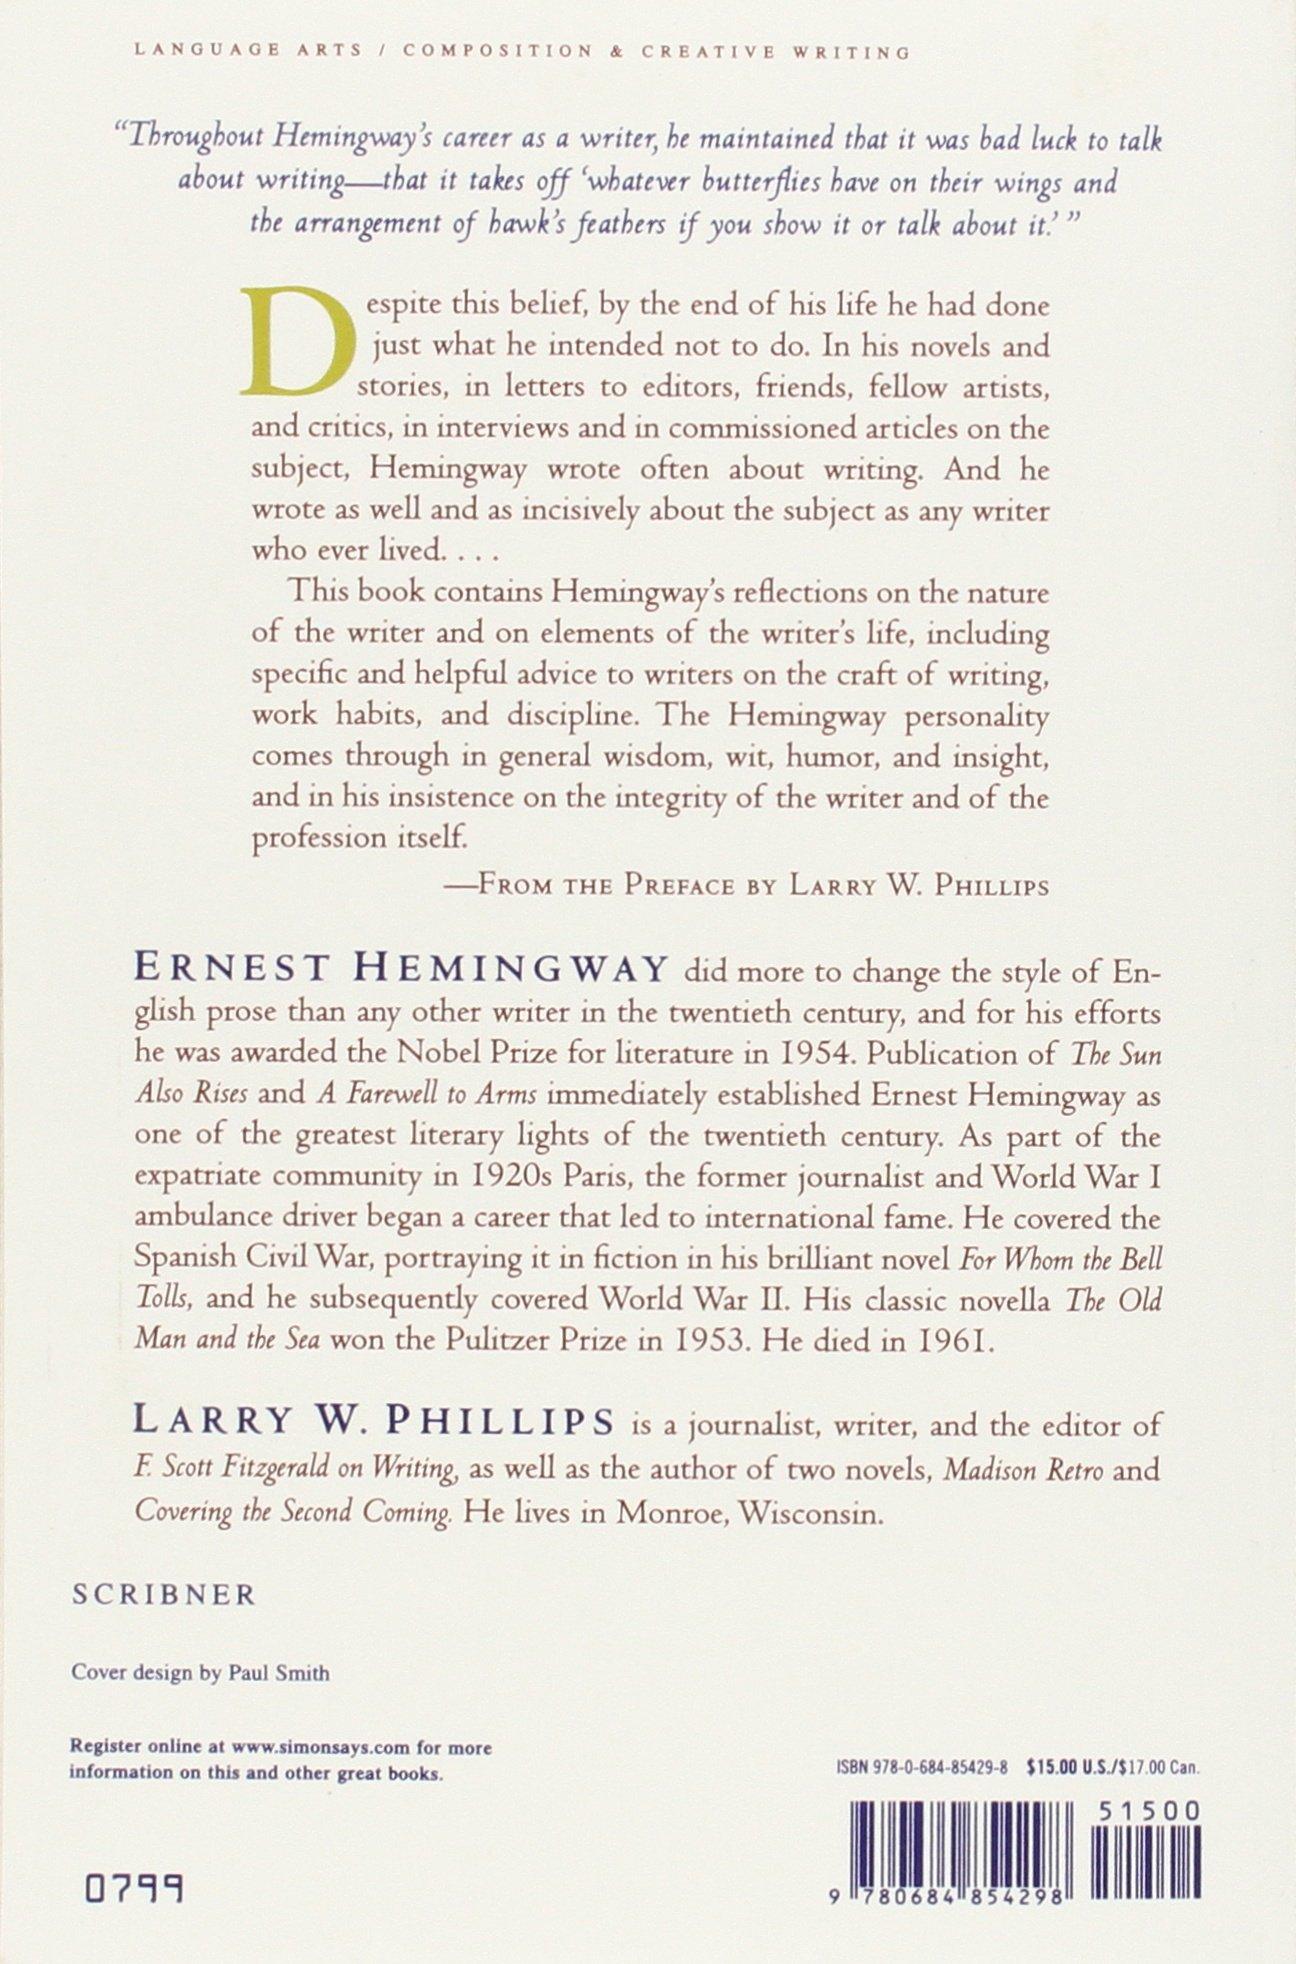 ernest hemingway s writing style essay example